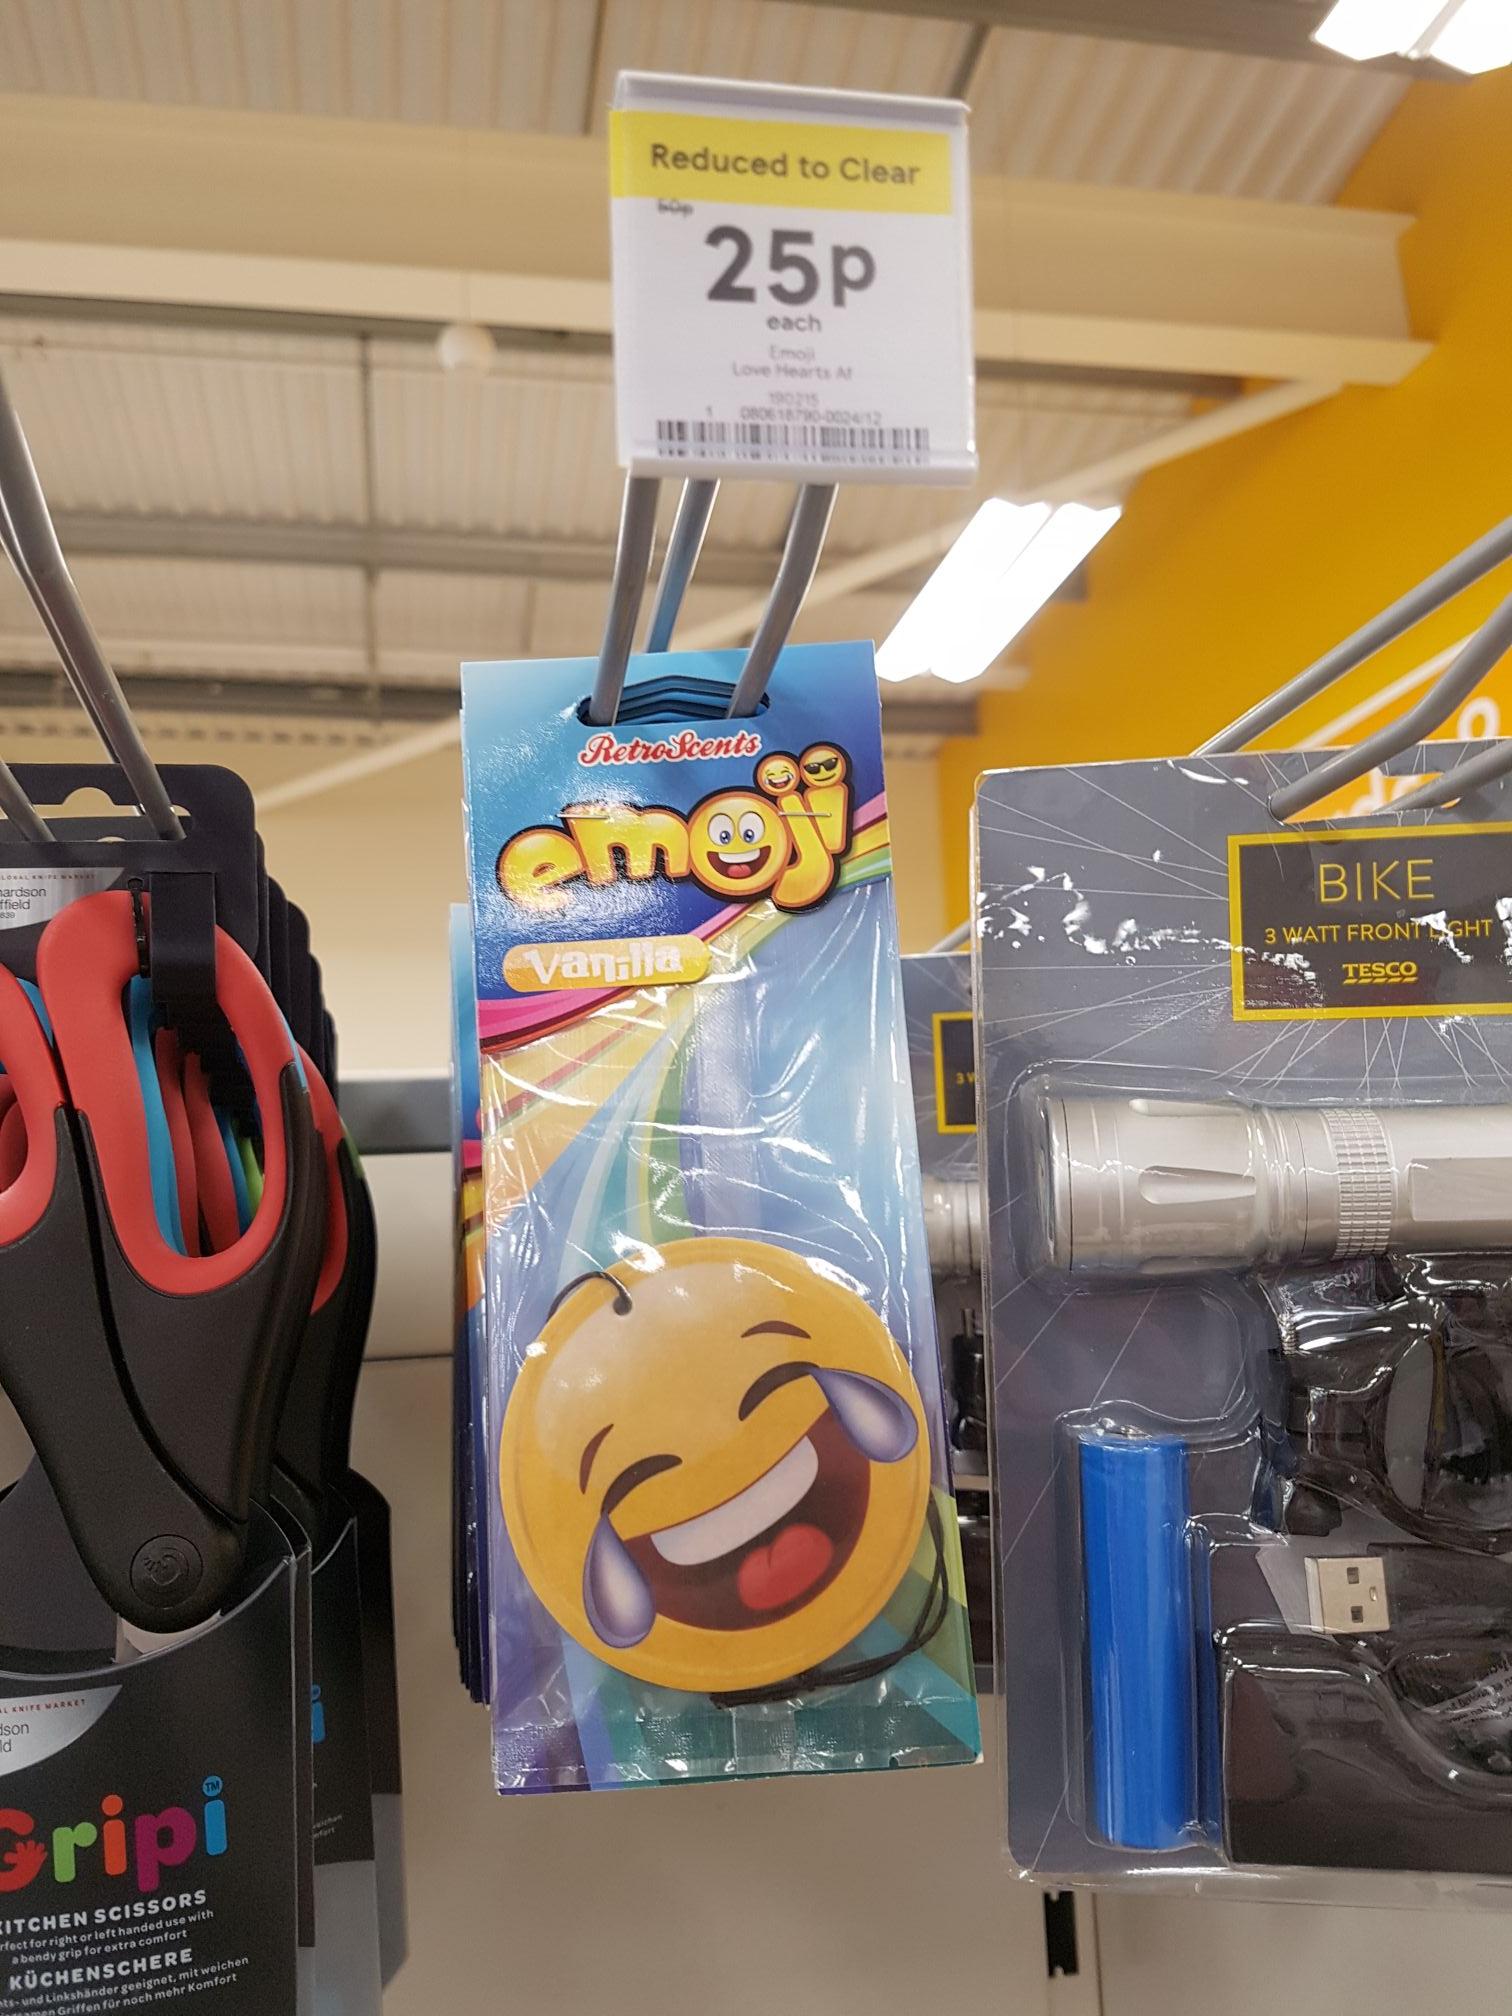 Emoji car air freshener - 25p instore @ Tesco (Liverpool)